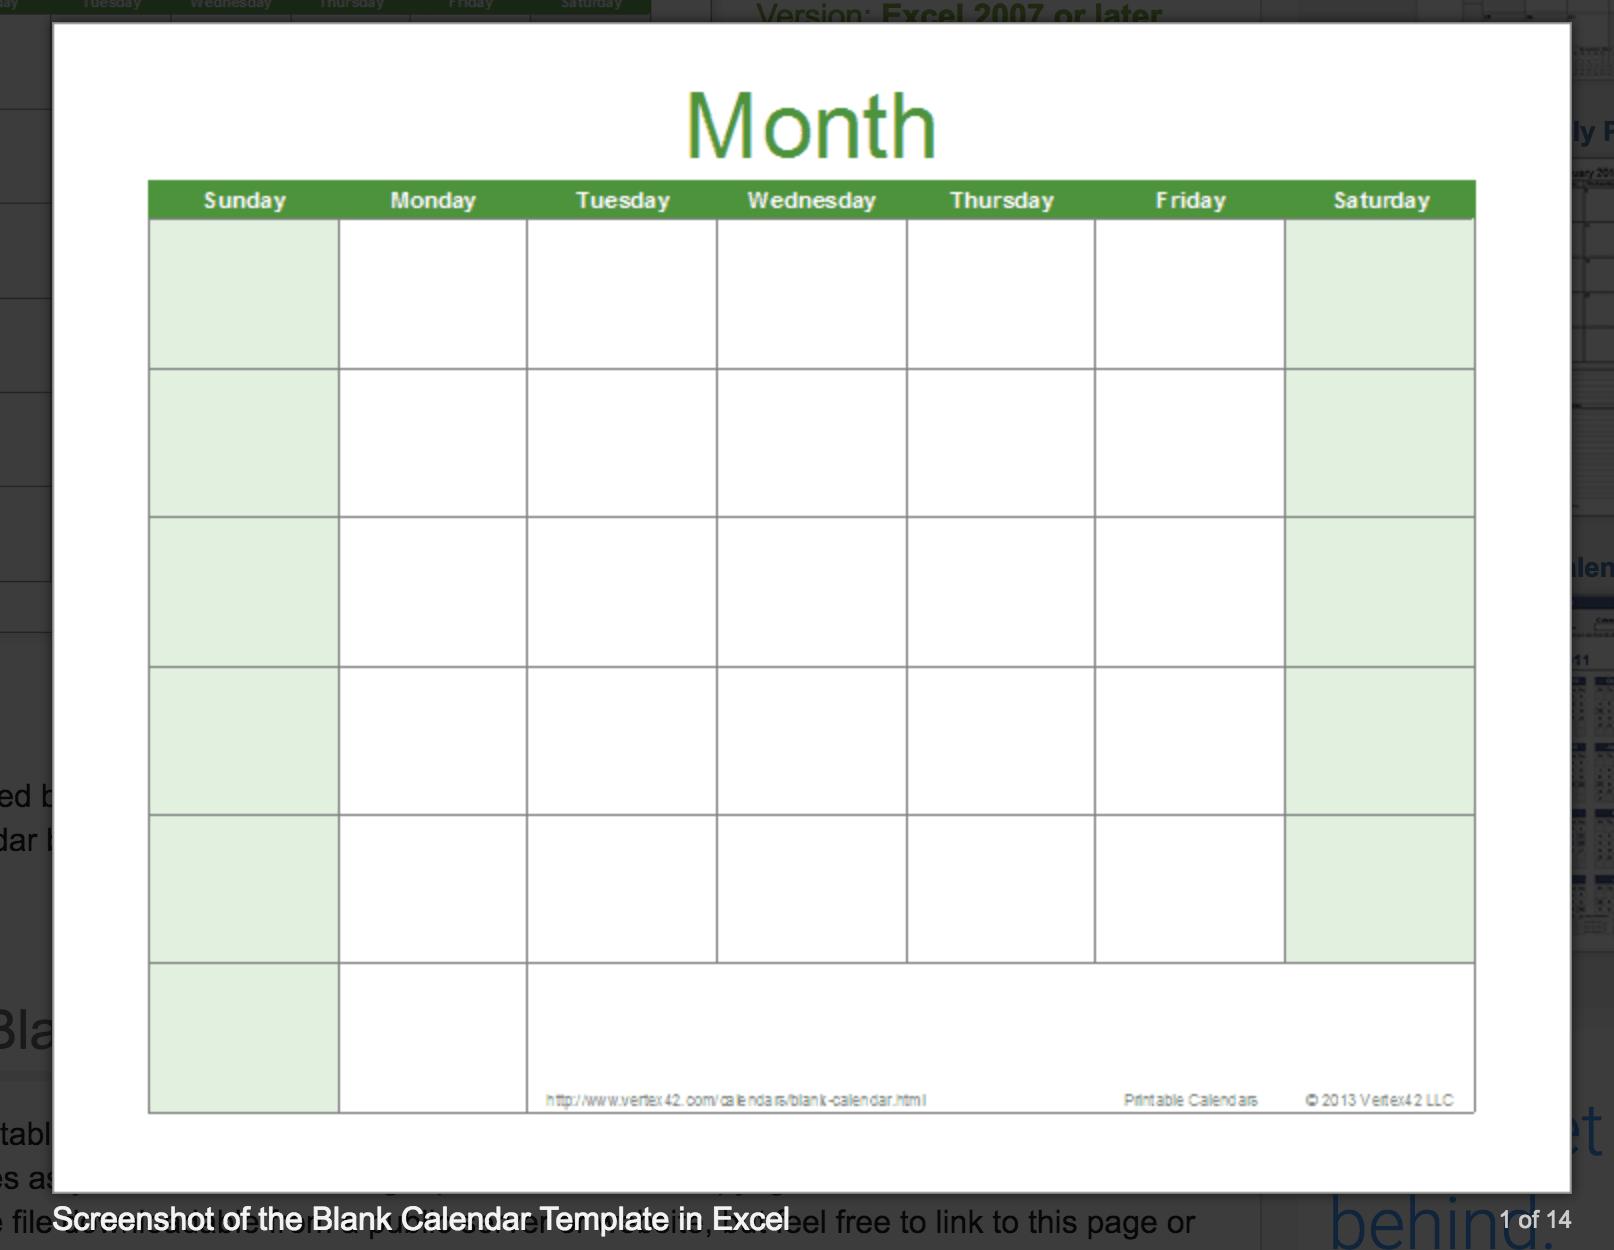 Blank Calendar: Wonderfully Printable 2019 Templates throughout Free Blank Calendars By Month